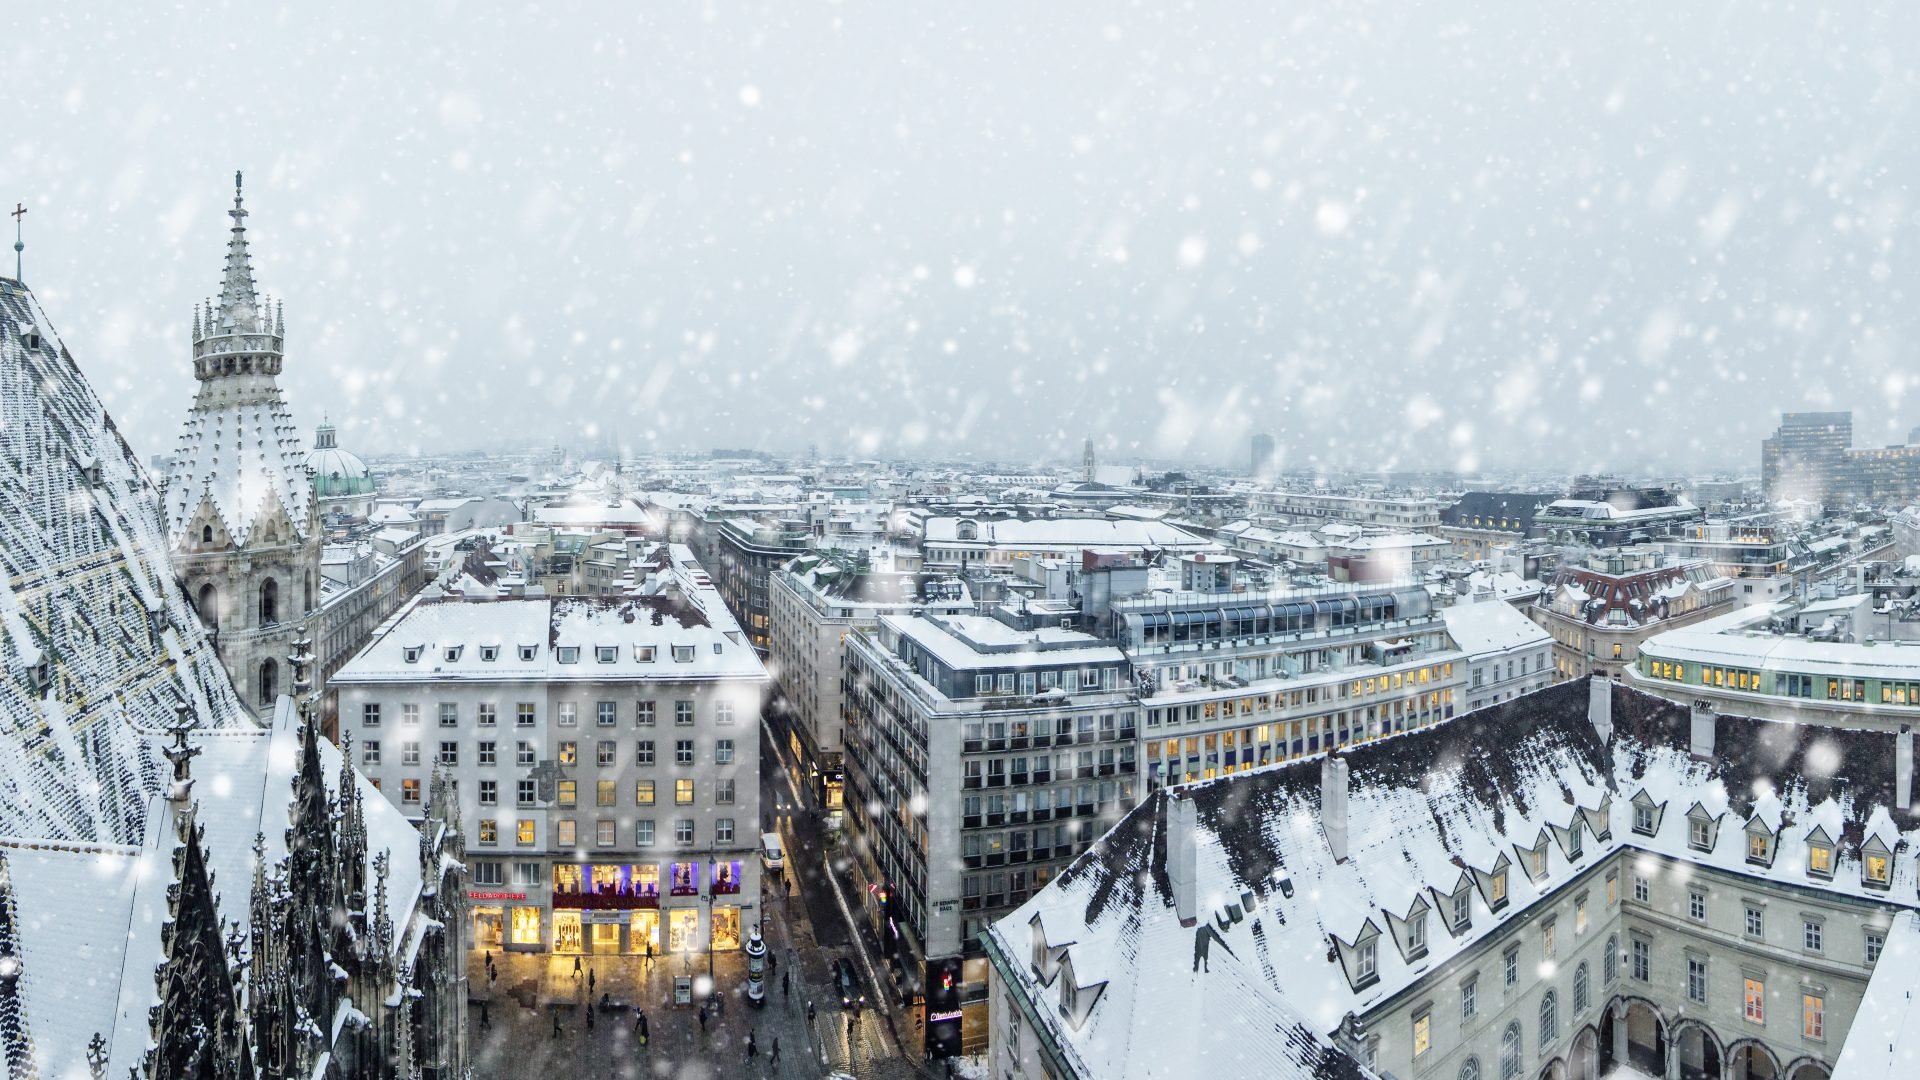 ©sans-souci-wien-winter-in-wien-blick-vom-stephansdom_c_wientourismus-christian-stemper-1920x1080